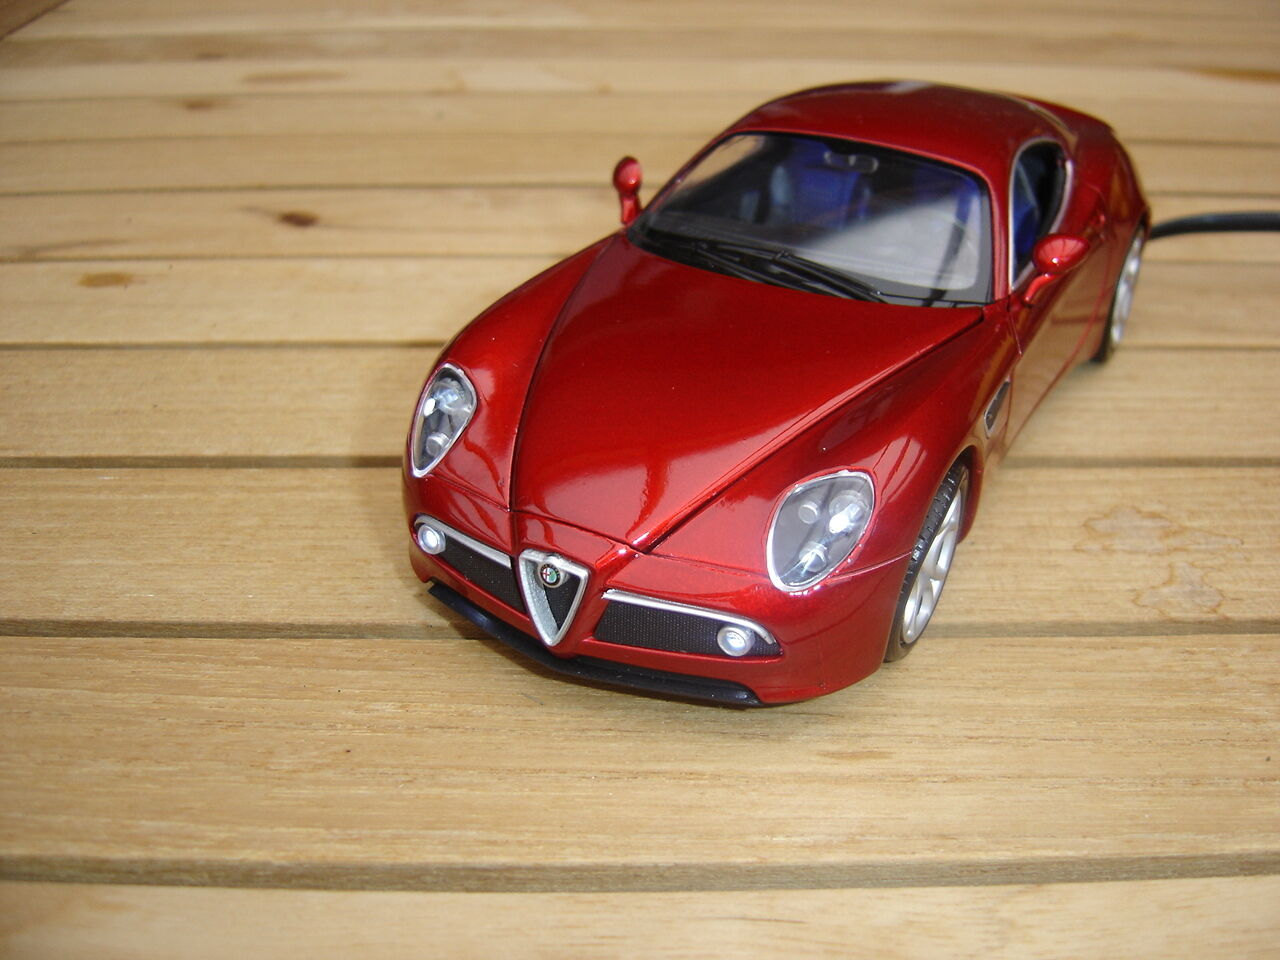 Alfa Romeo 8 C Competizione avec DEL-éclairage (Xénon) incl. Désir plaque d'immatriculation 1 24